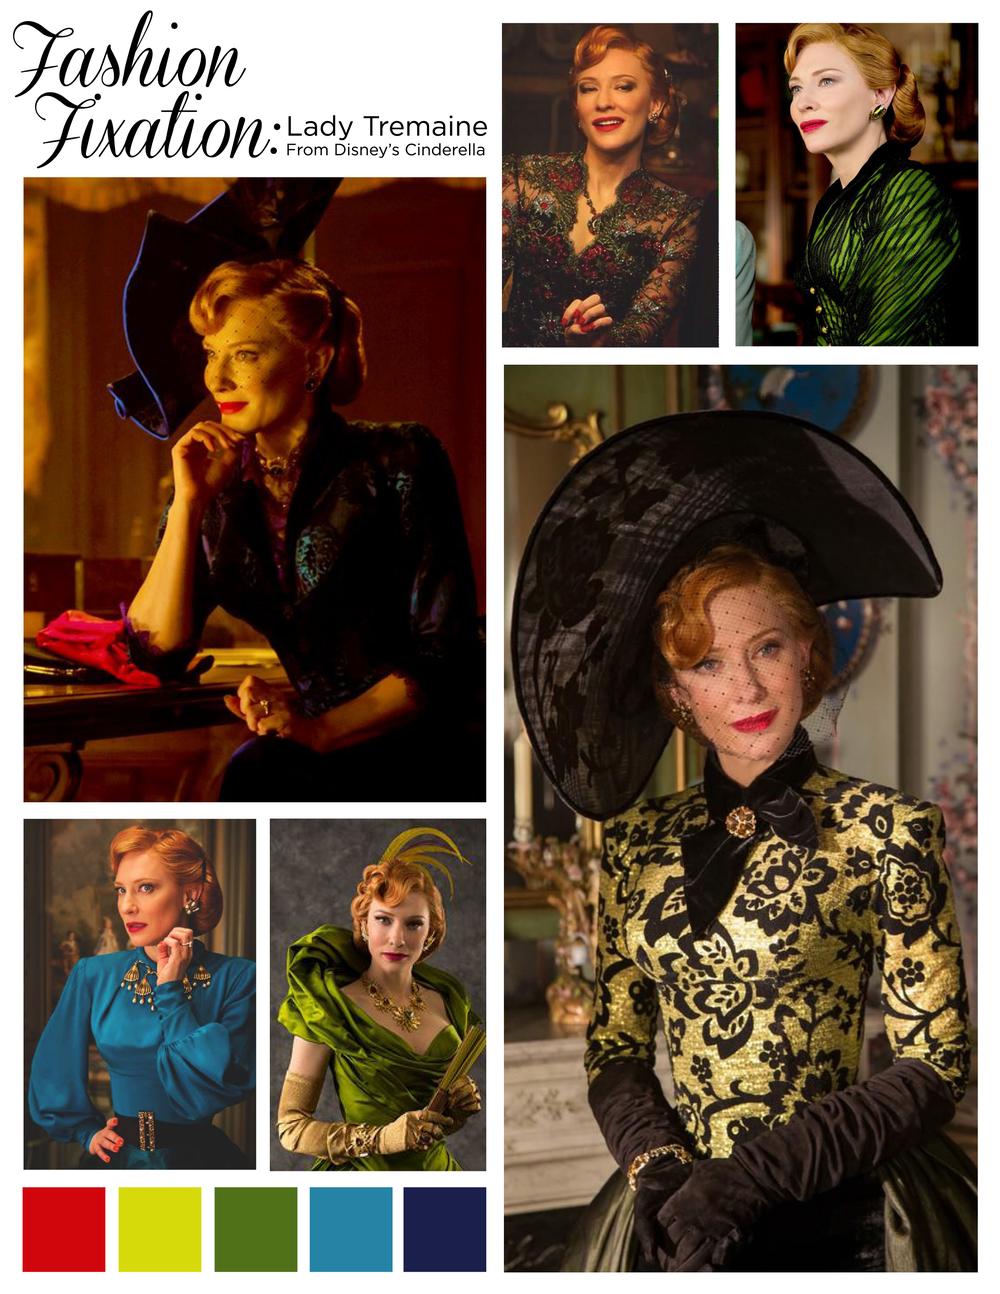 Aly Rose Vintage Fashion Fixation Cinderella Lady Tremaine